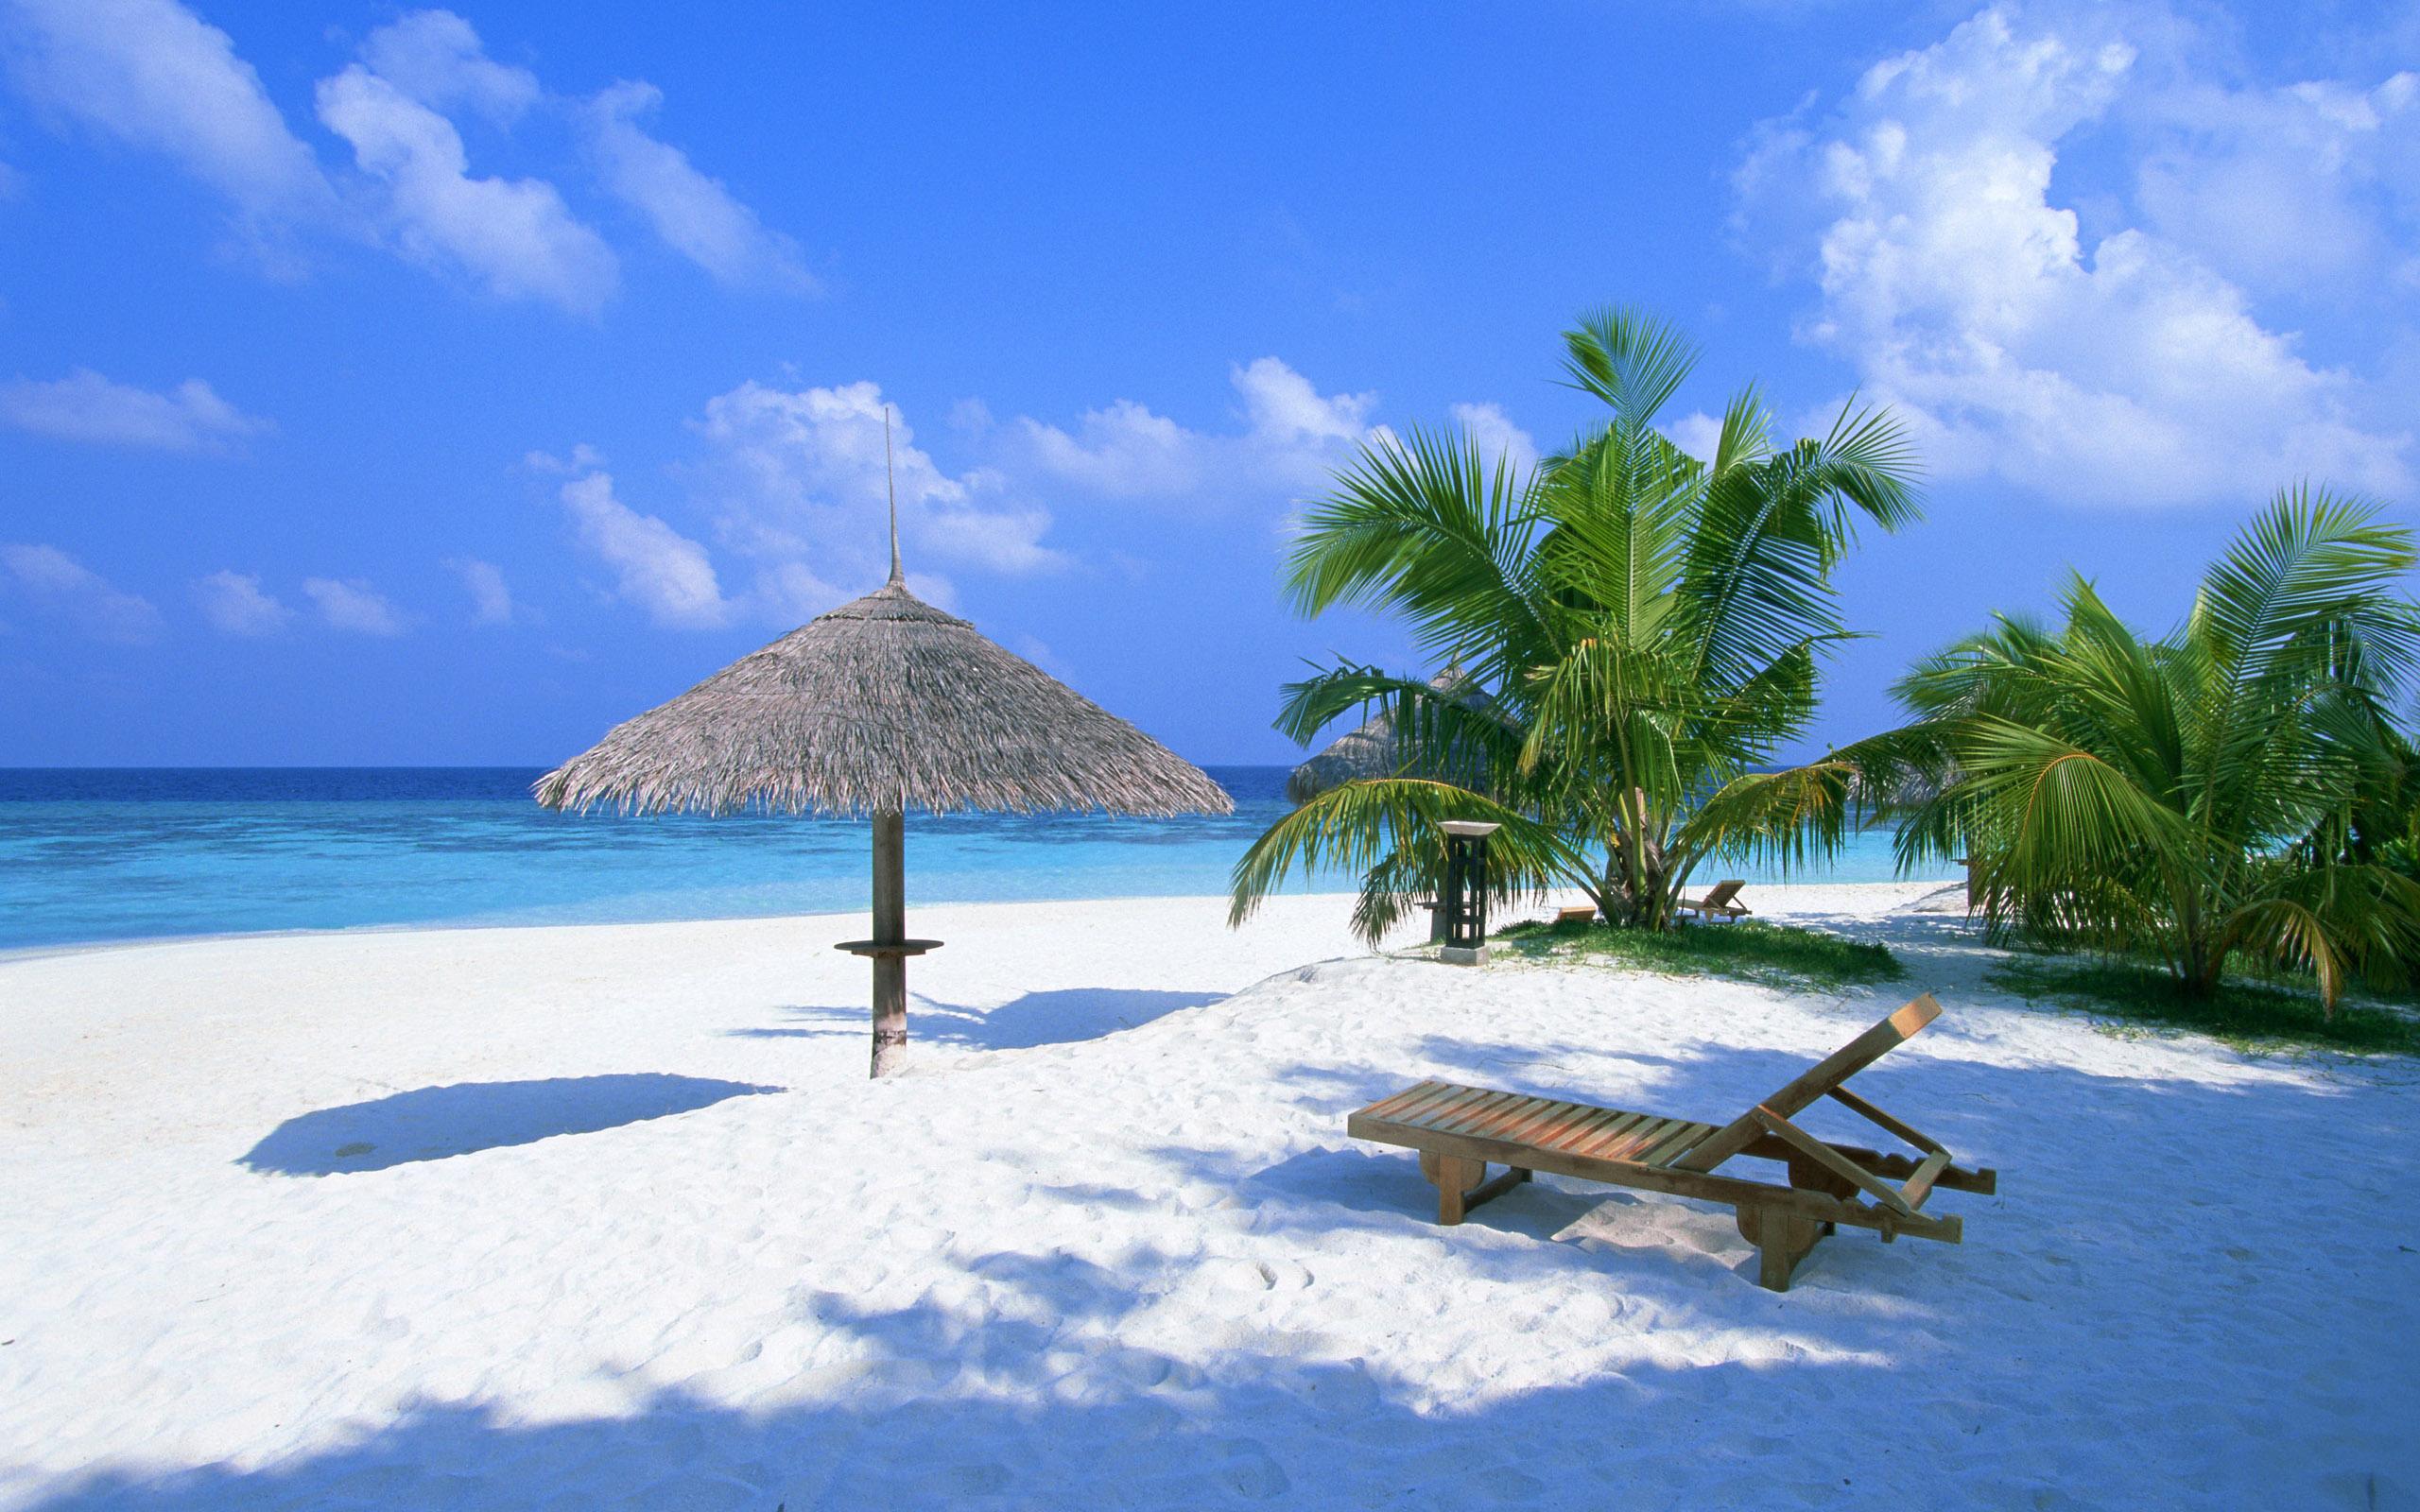 Maldives Island Desktop Backgrounds | Free Maldives Island Desktop ...